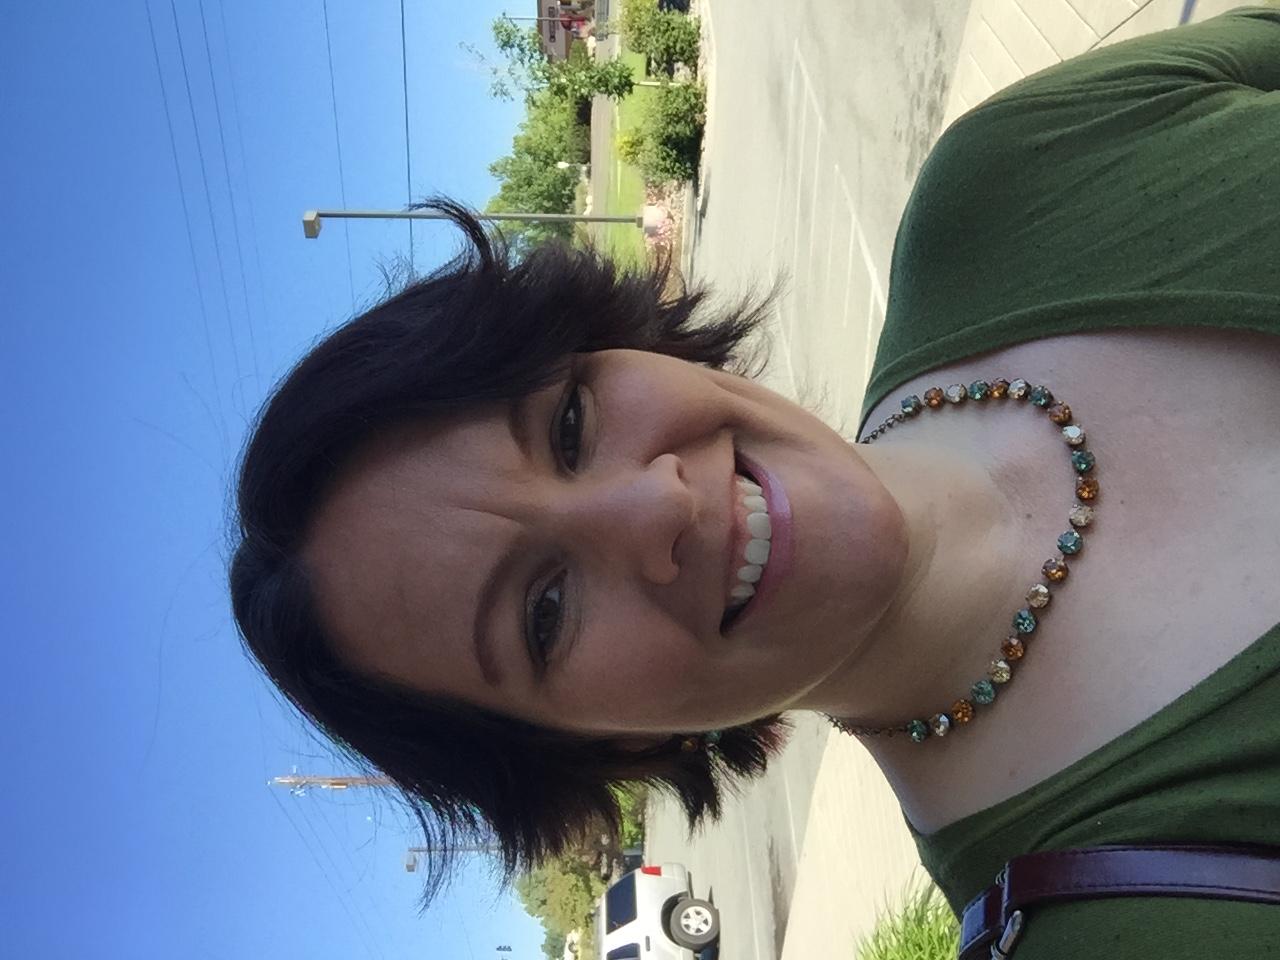 Angela Spires